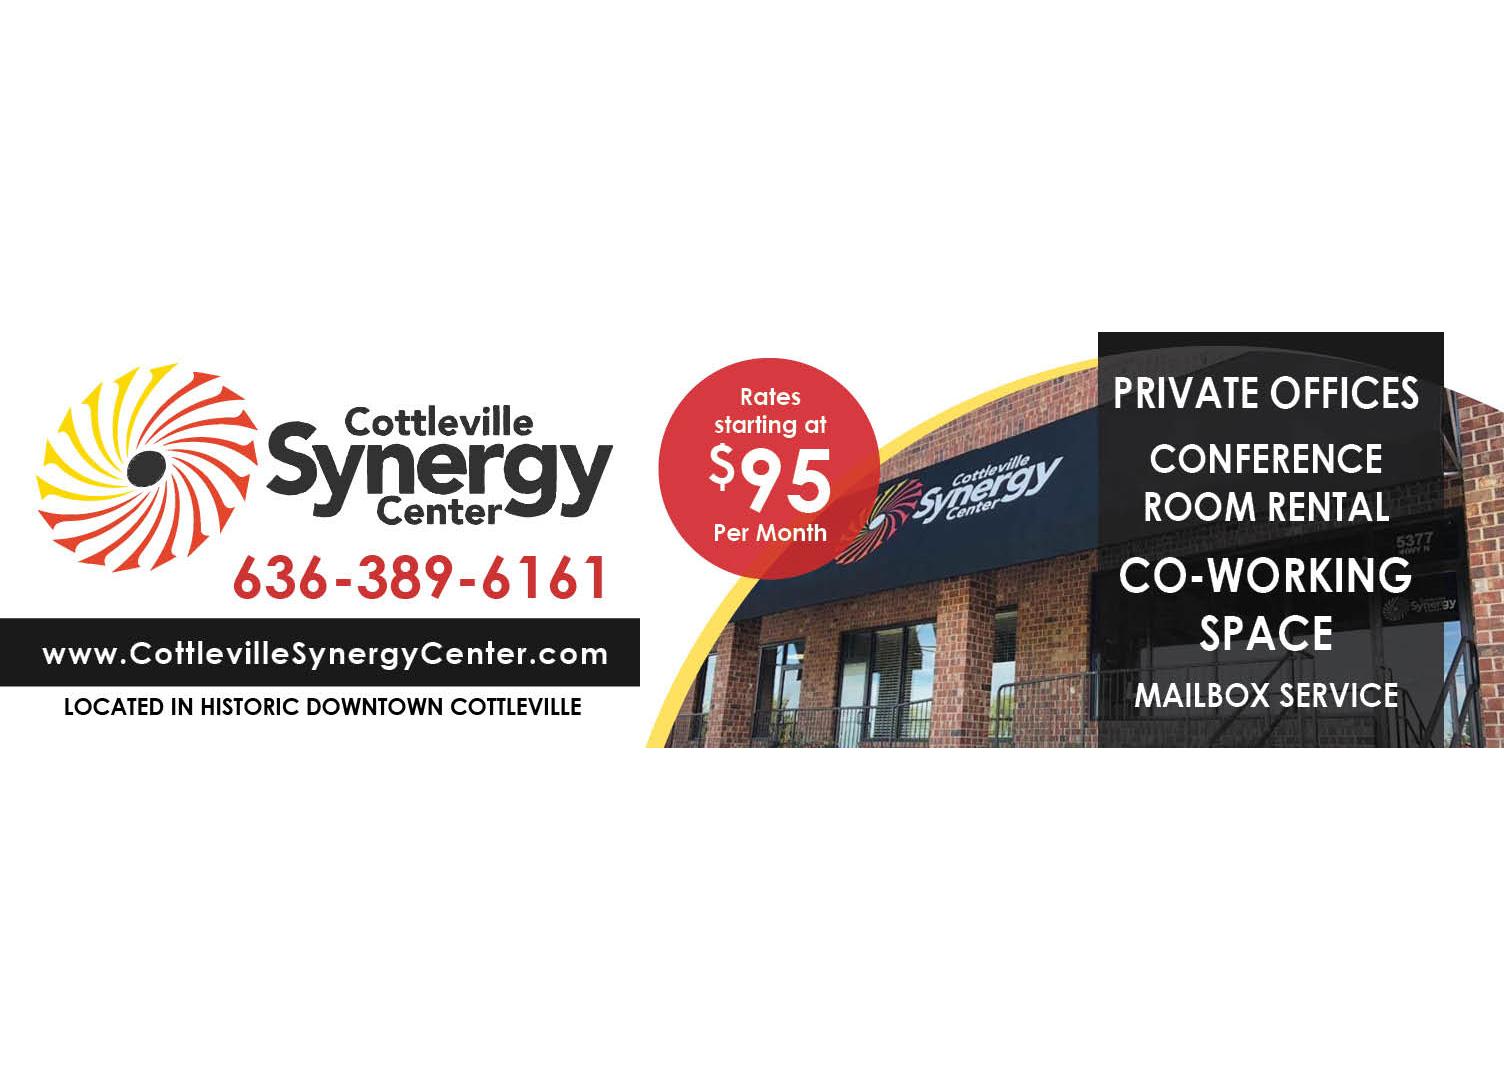 Billboard_Synergy-Center18